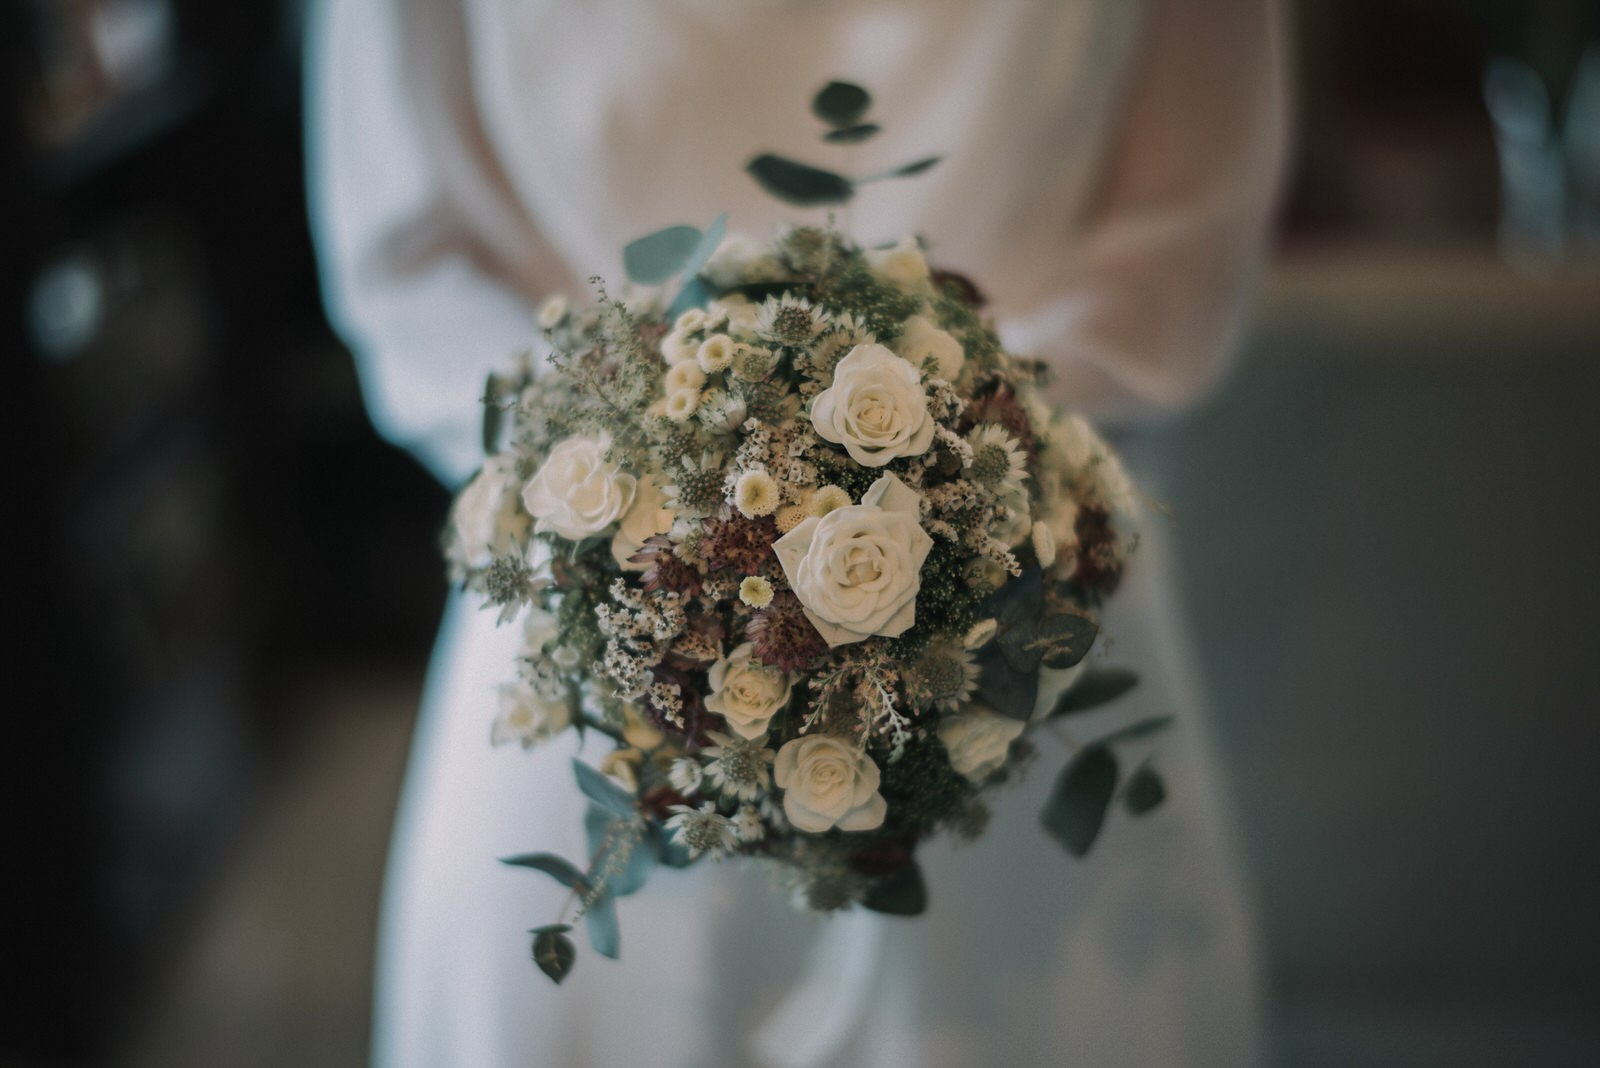 fotografo de bodas sevilla - fotografo boda - fotografía sevilla - Andrés AmarilloAAA_4597- tele- fine.JPG